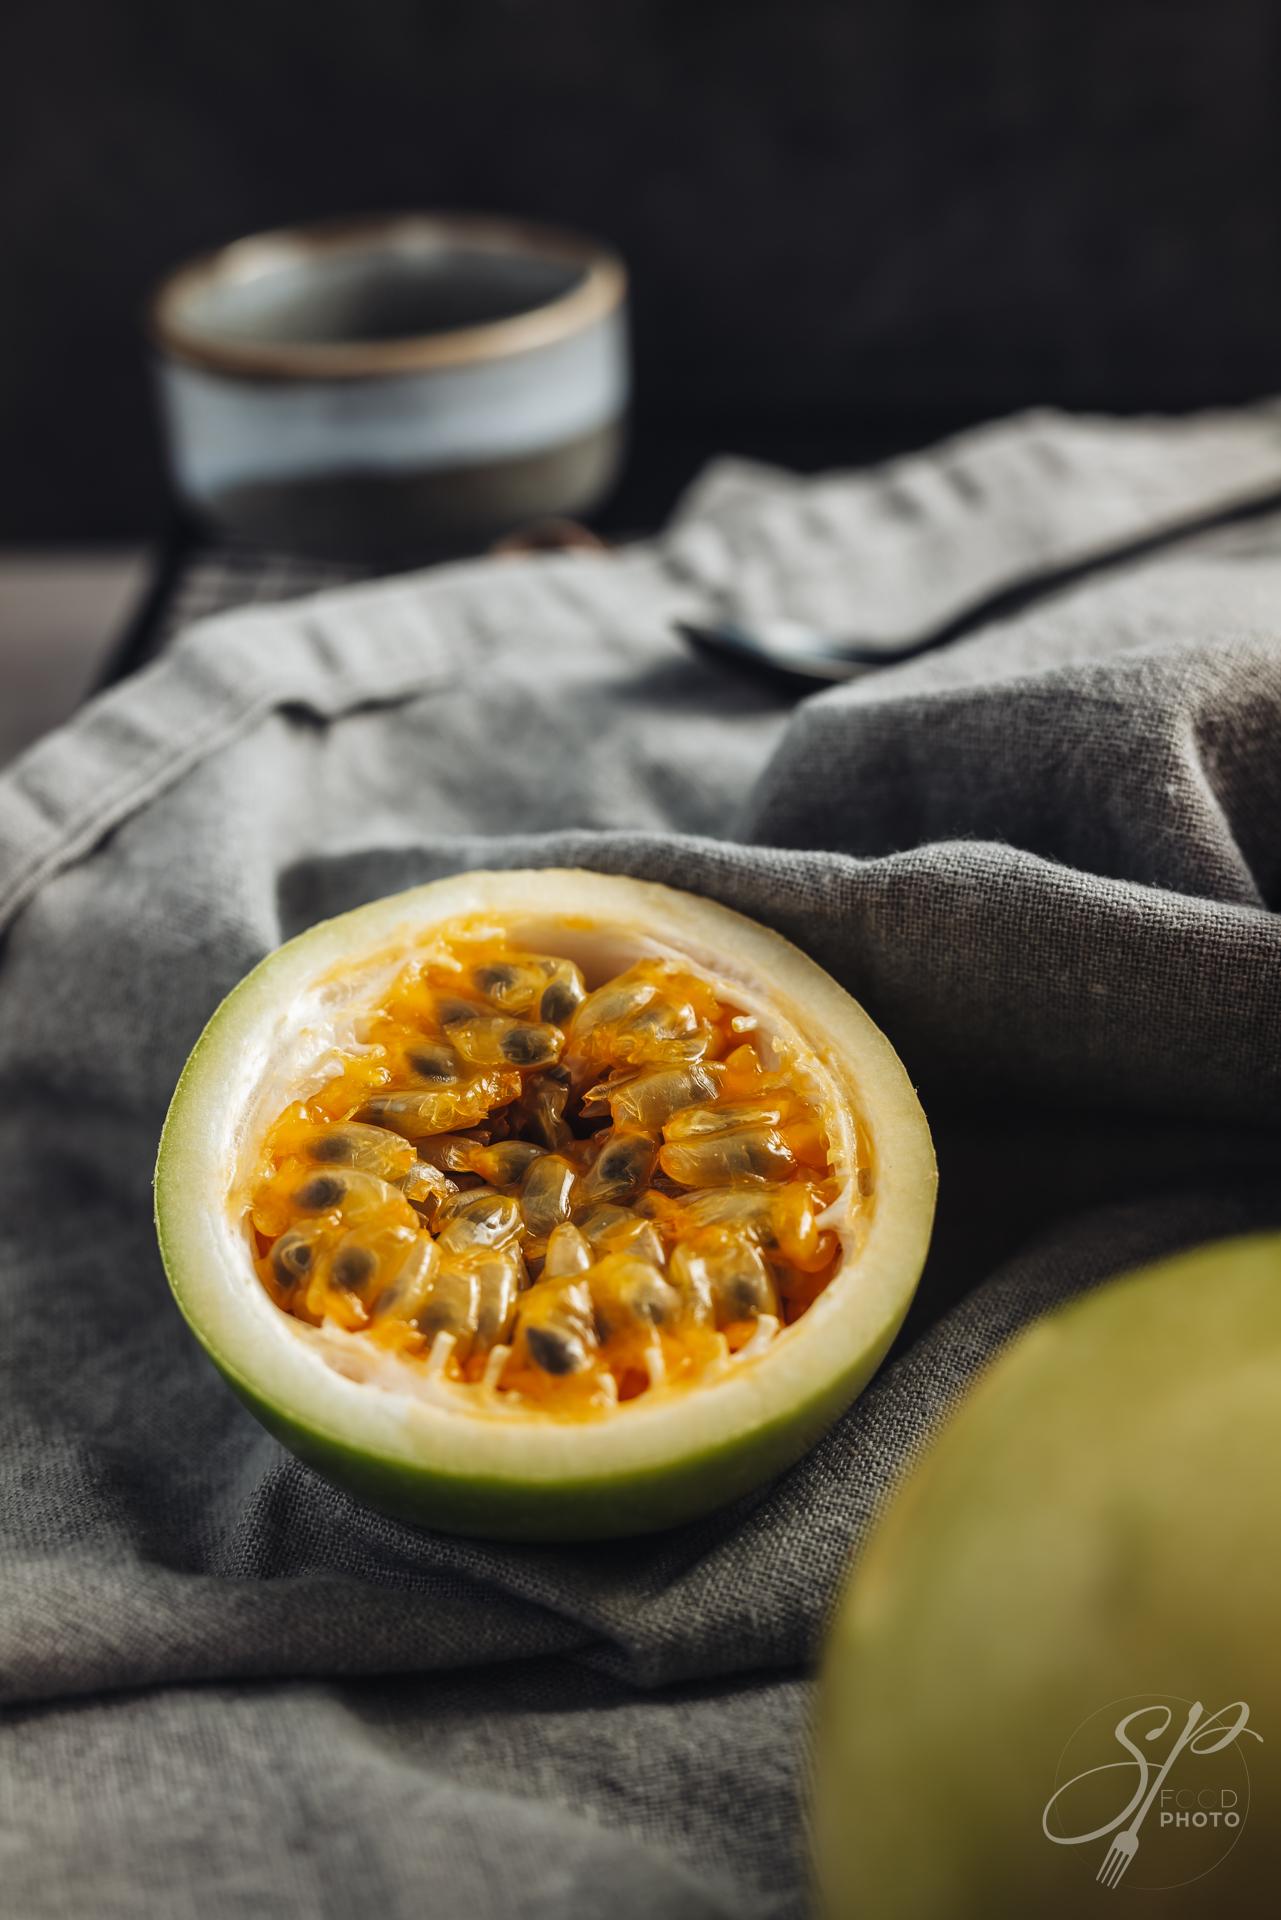 Fresh and juicy raw maracuja fruit